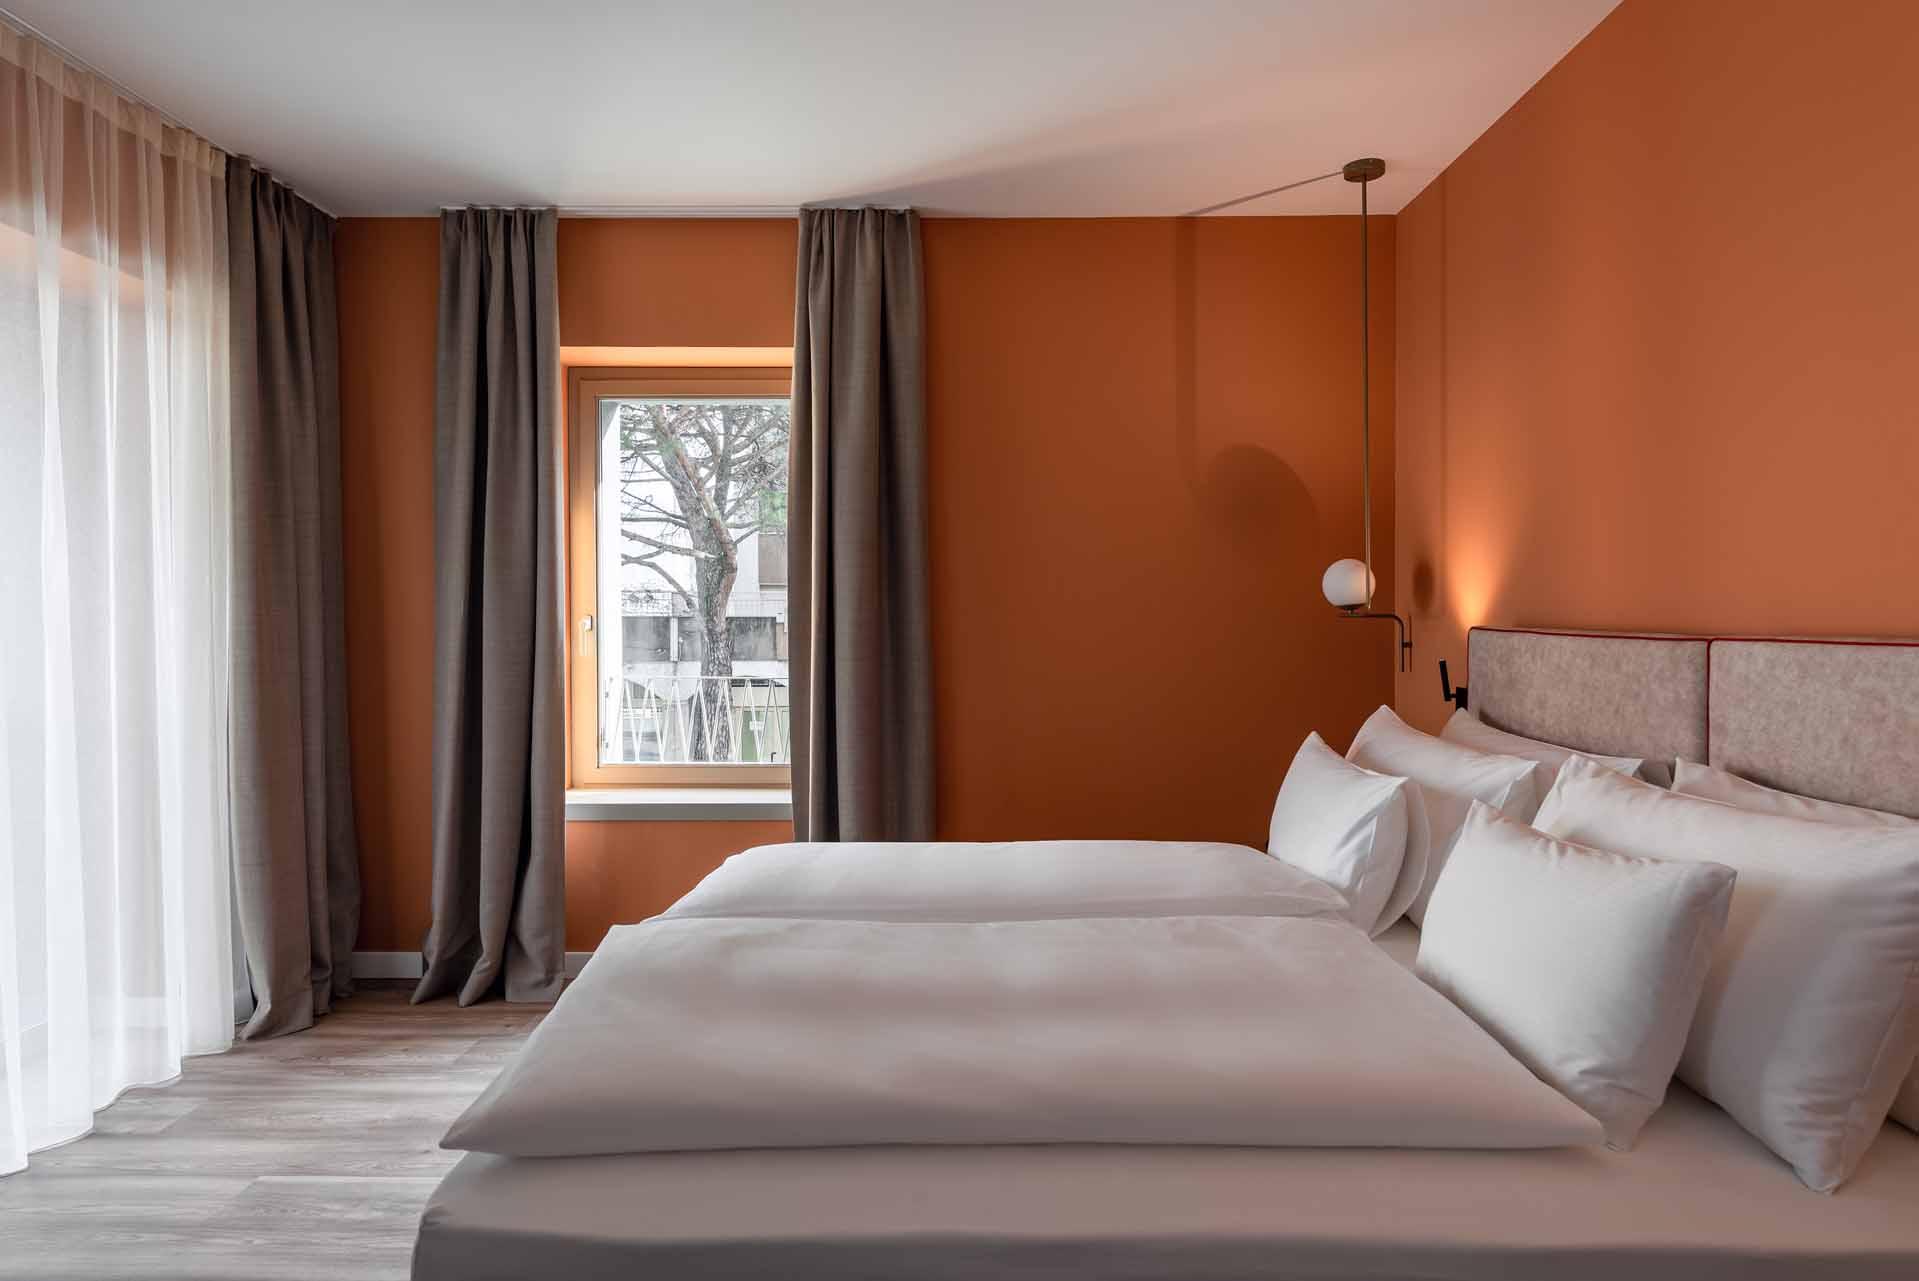 Hotel Trieste Gradisca 010